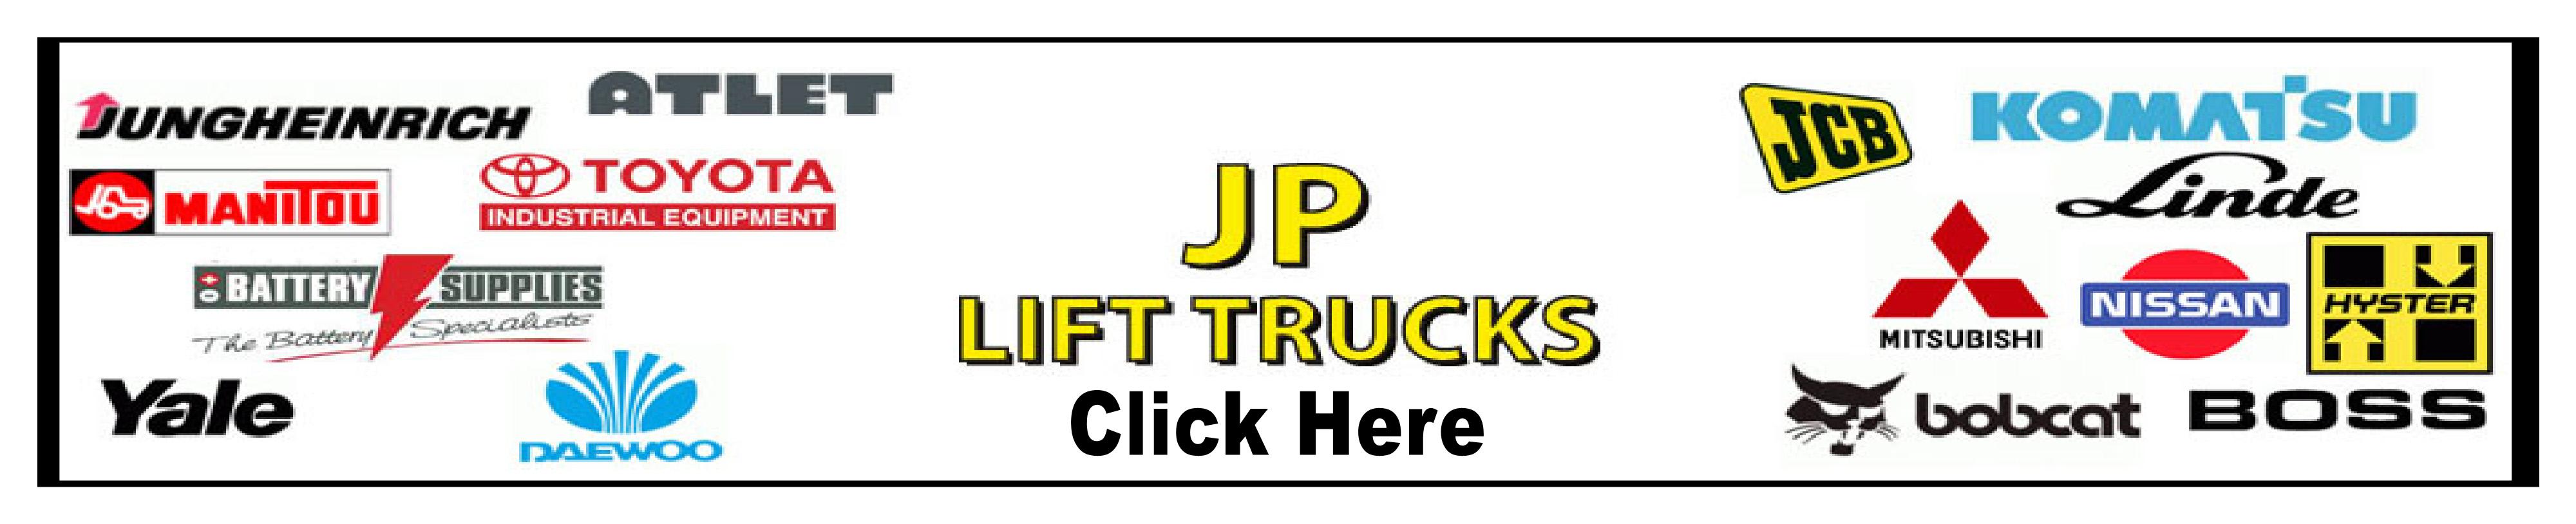 J P LIFT TRUCKS   FORKLIFT AND SAFETY TRAINING in LIMERICK, Co ... Jp Car Parts Cork on gb car, si car, mo car, eg car,